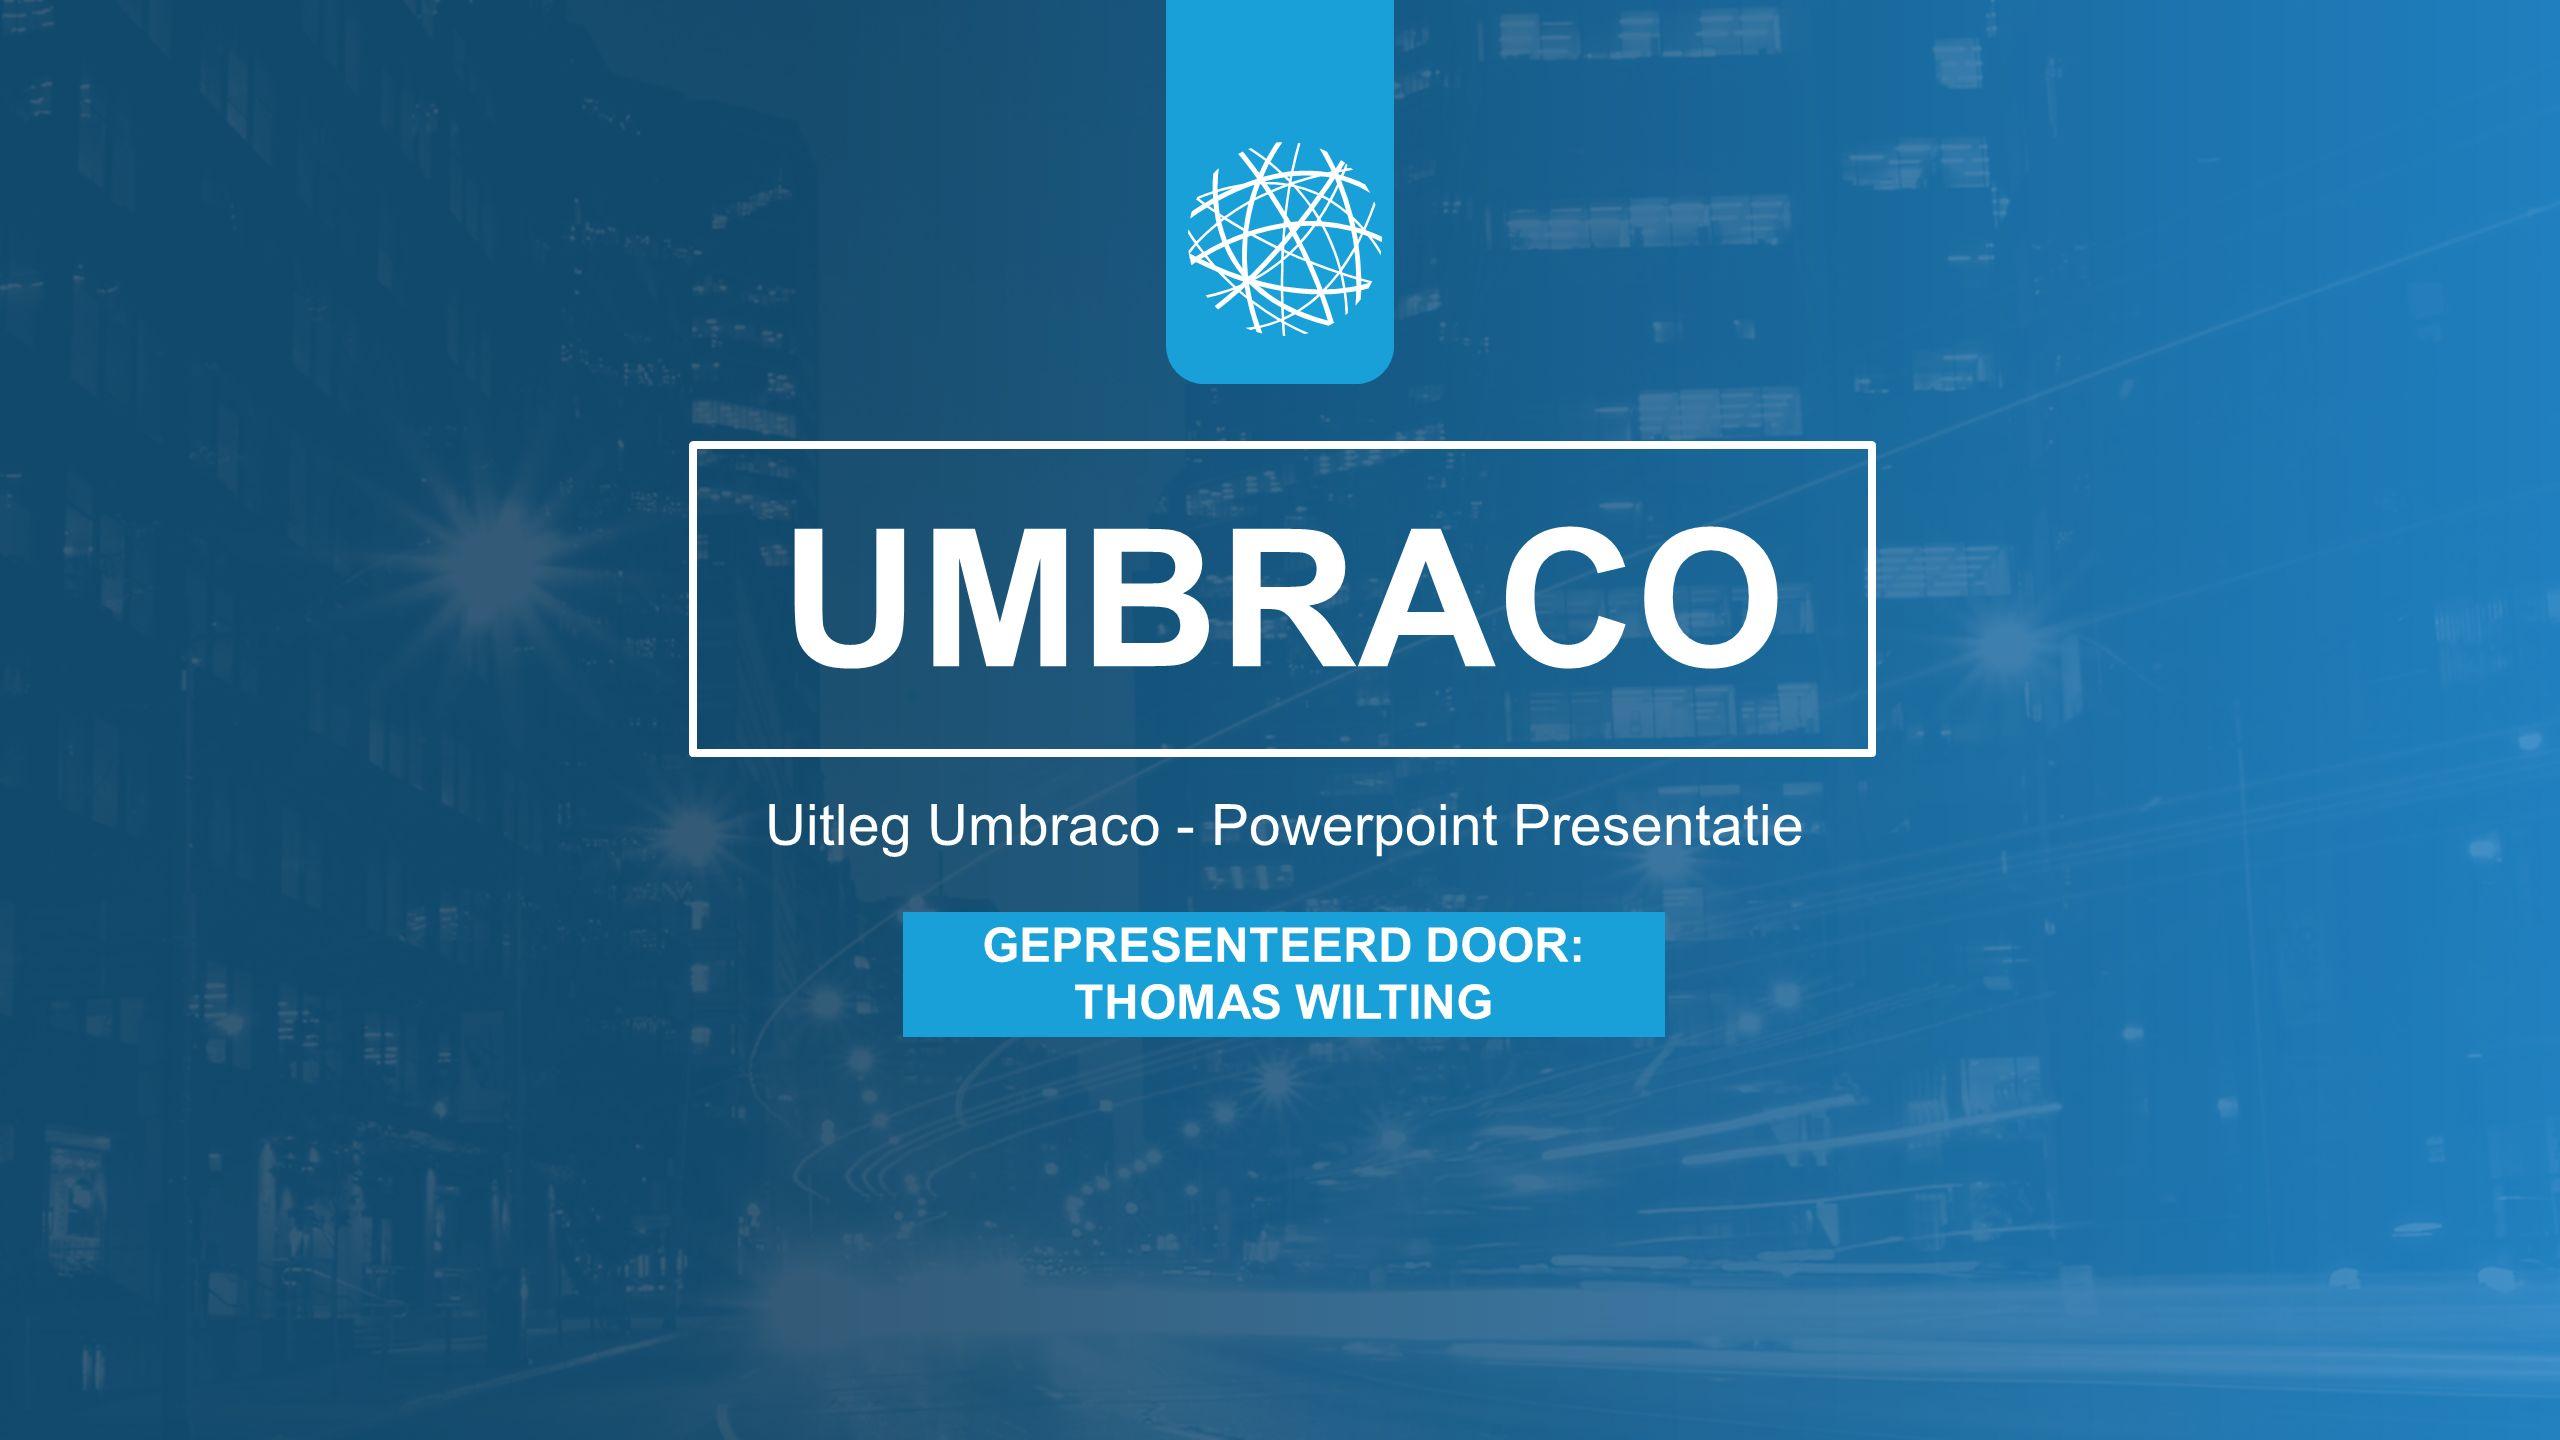 Uitleg Umbraco - Powerpoint Presentatie